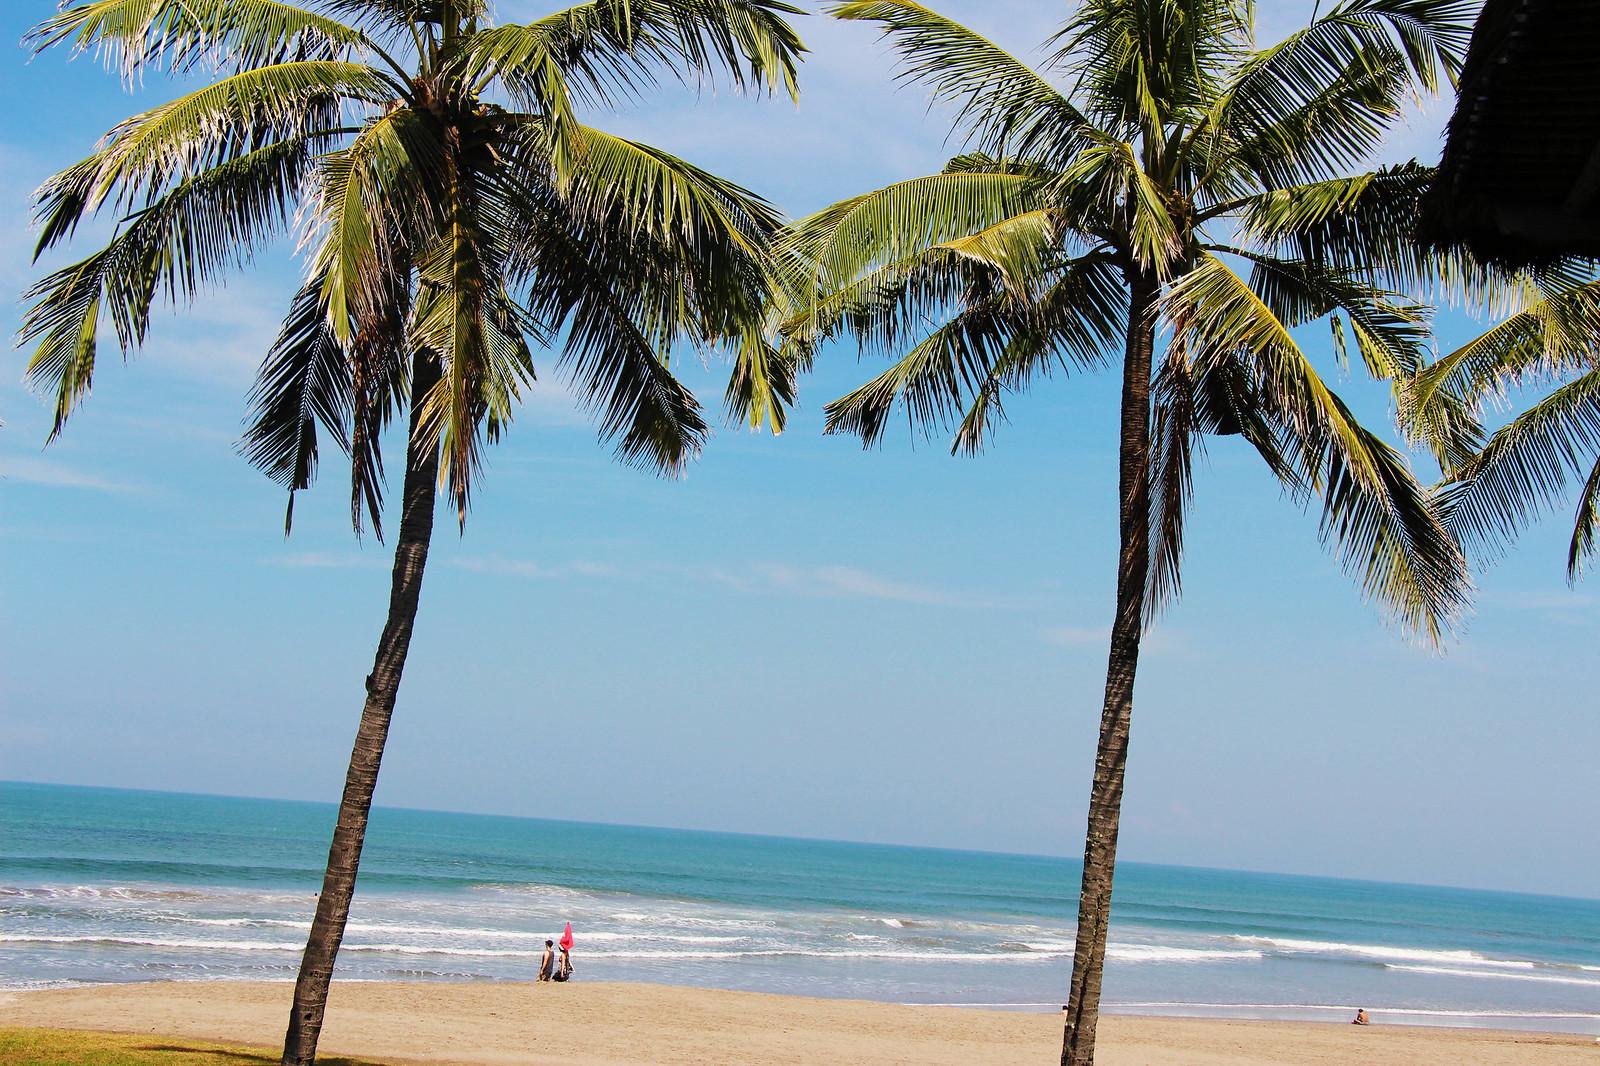 La Lucciola Bali, Seminyak beach, bali, Bali travel tips